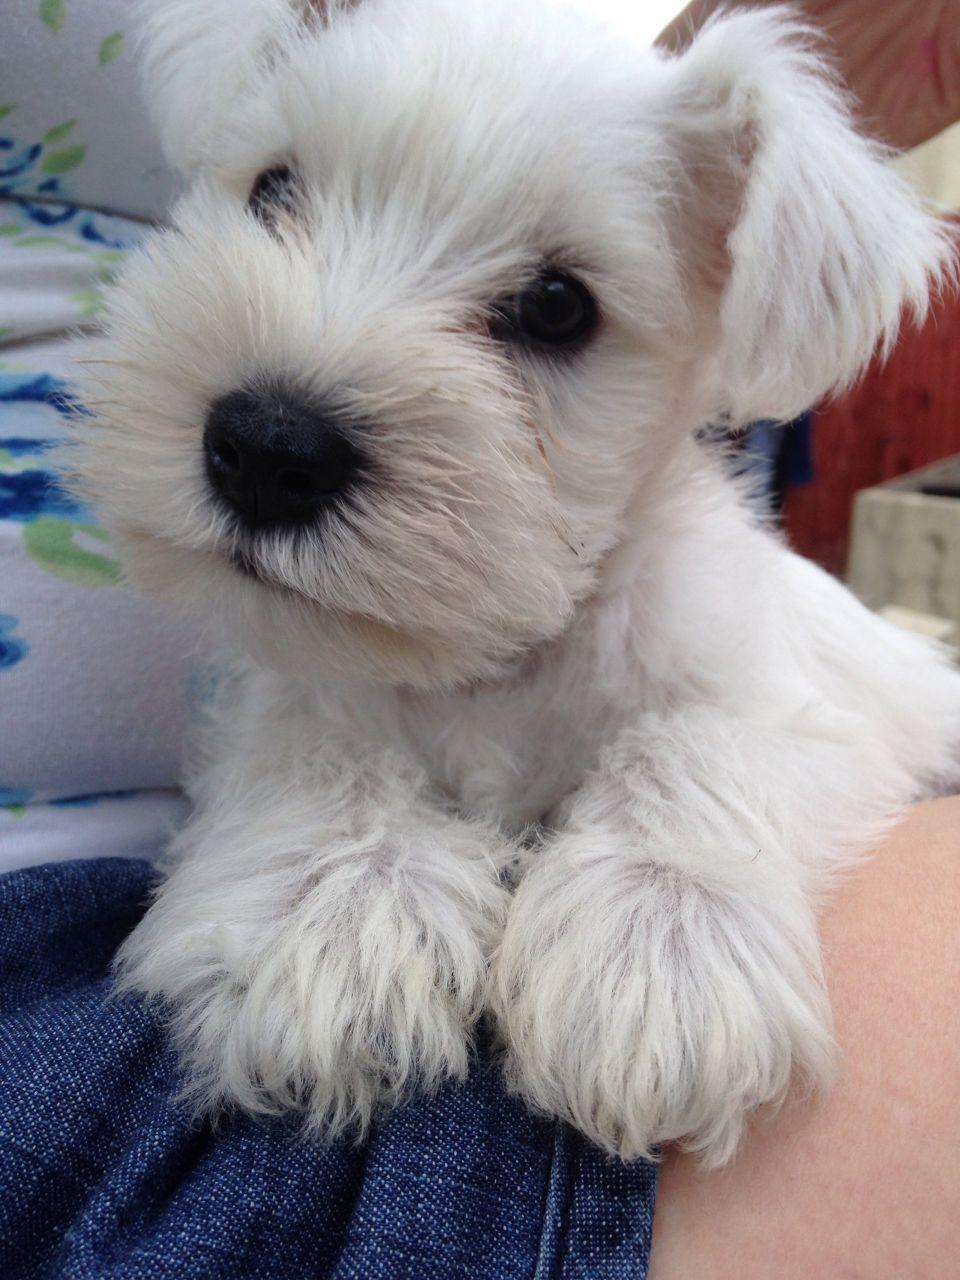 White Miniature Schnauzer Puppies For Sale Pontypridd Rhondda Cynon Taff Pets4homes In 2020 White Miniature Schnauzer Schnauzer Puppy Miniature Schnauzer Puppies